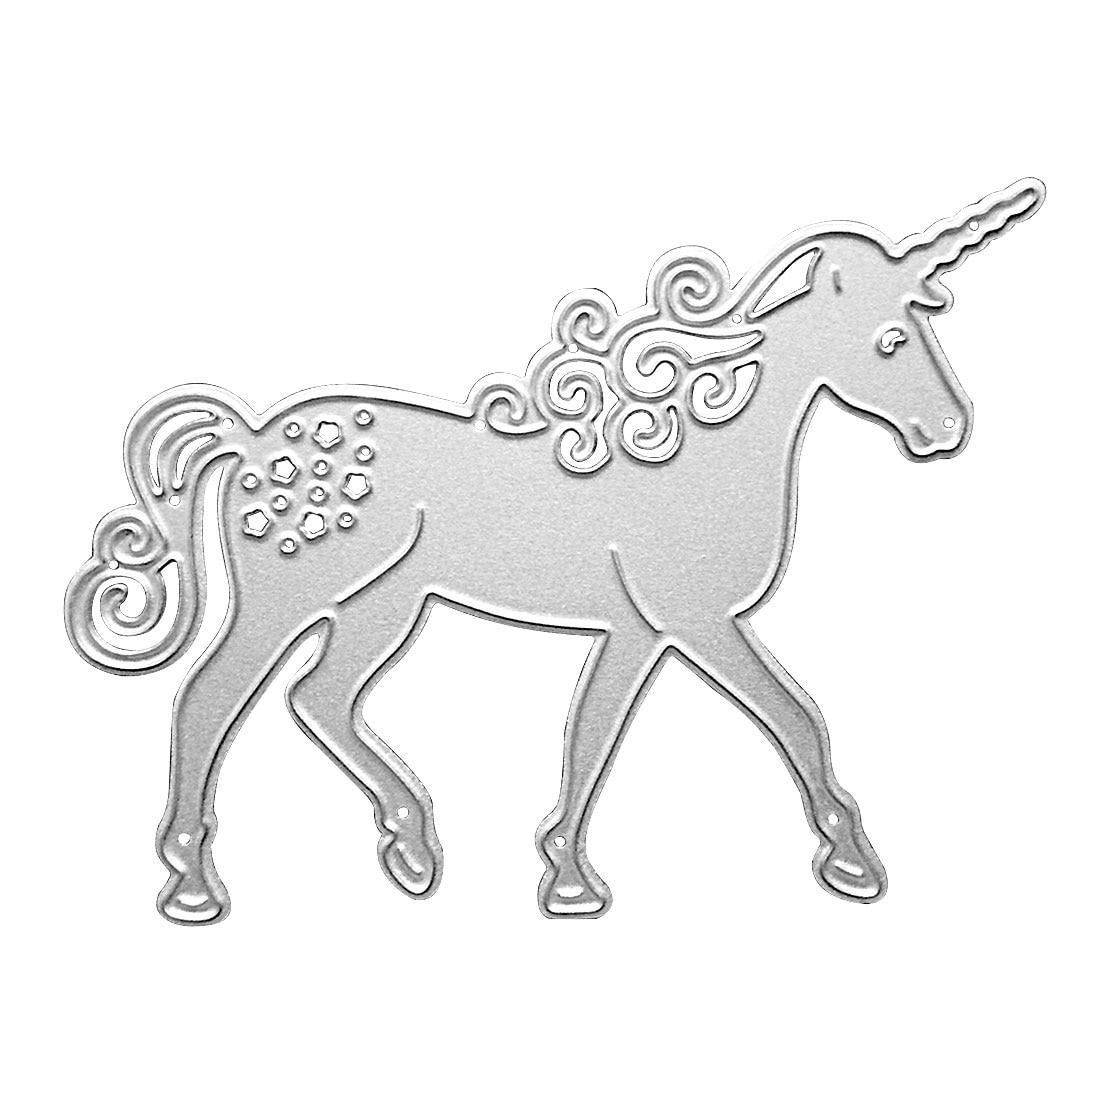 Hot Sale Unicorn Horse Metal Cutting Dies Stencil DIY Scrapbooking Card Paper Embossing Craft